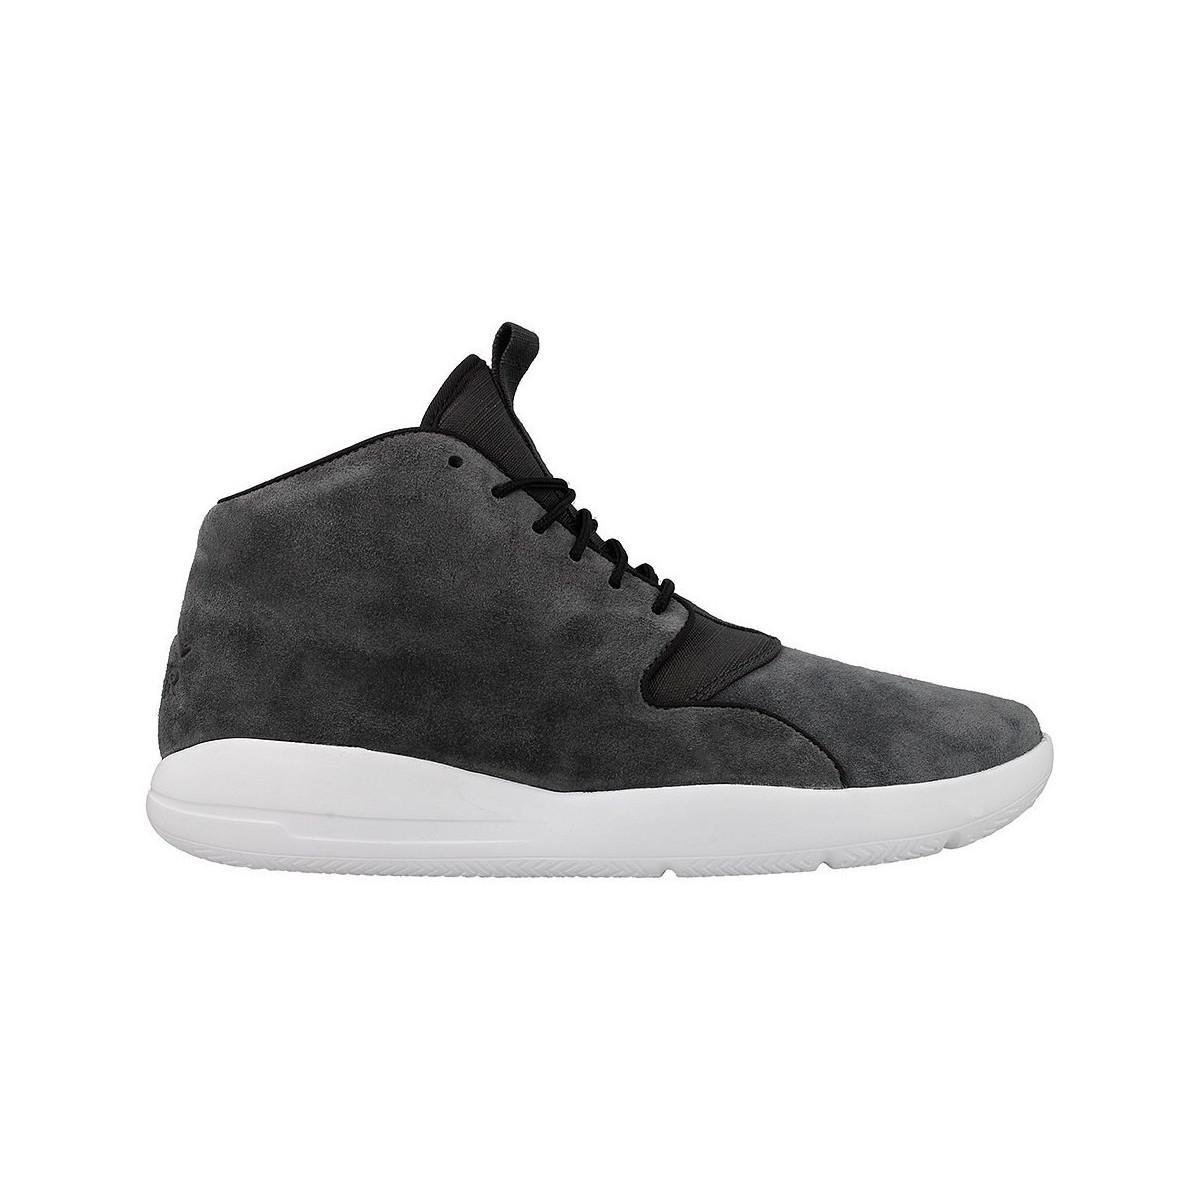 d33bb1f1c0d ... Jordan Eclipse Chukka Men's Shoes (high-top Trainers) In Multicolour.  View fullscreen